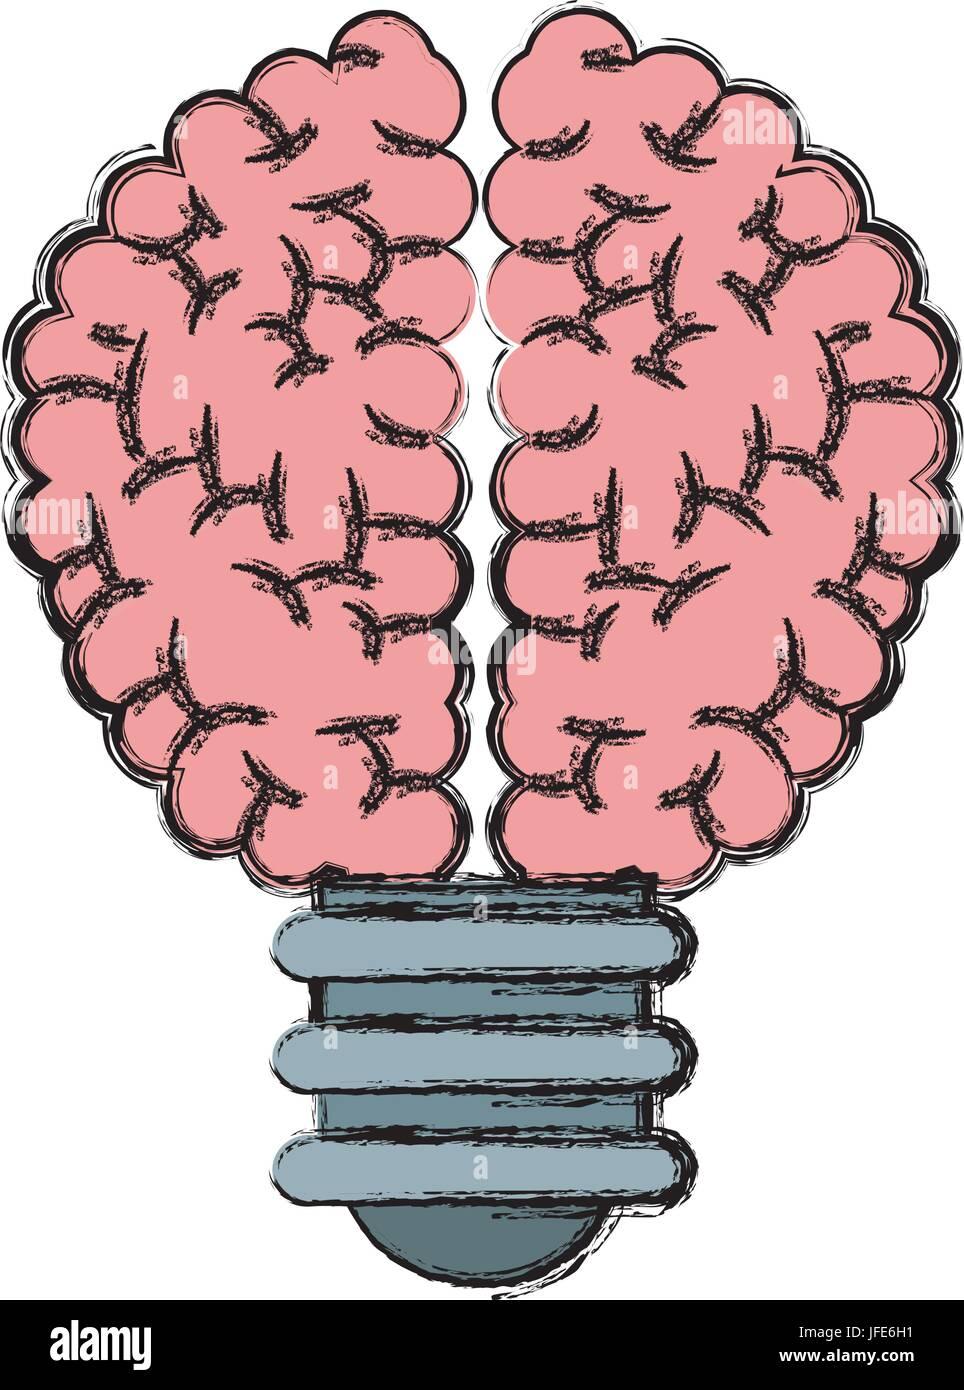 buld brain idea creativity knowledge - Stock Image